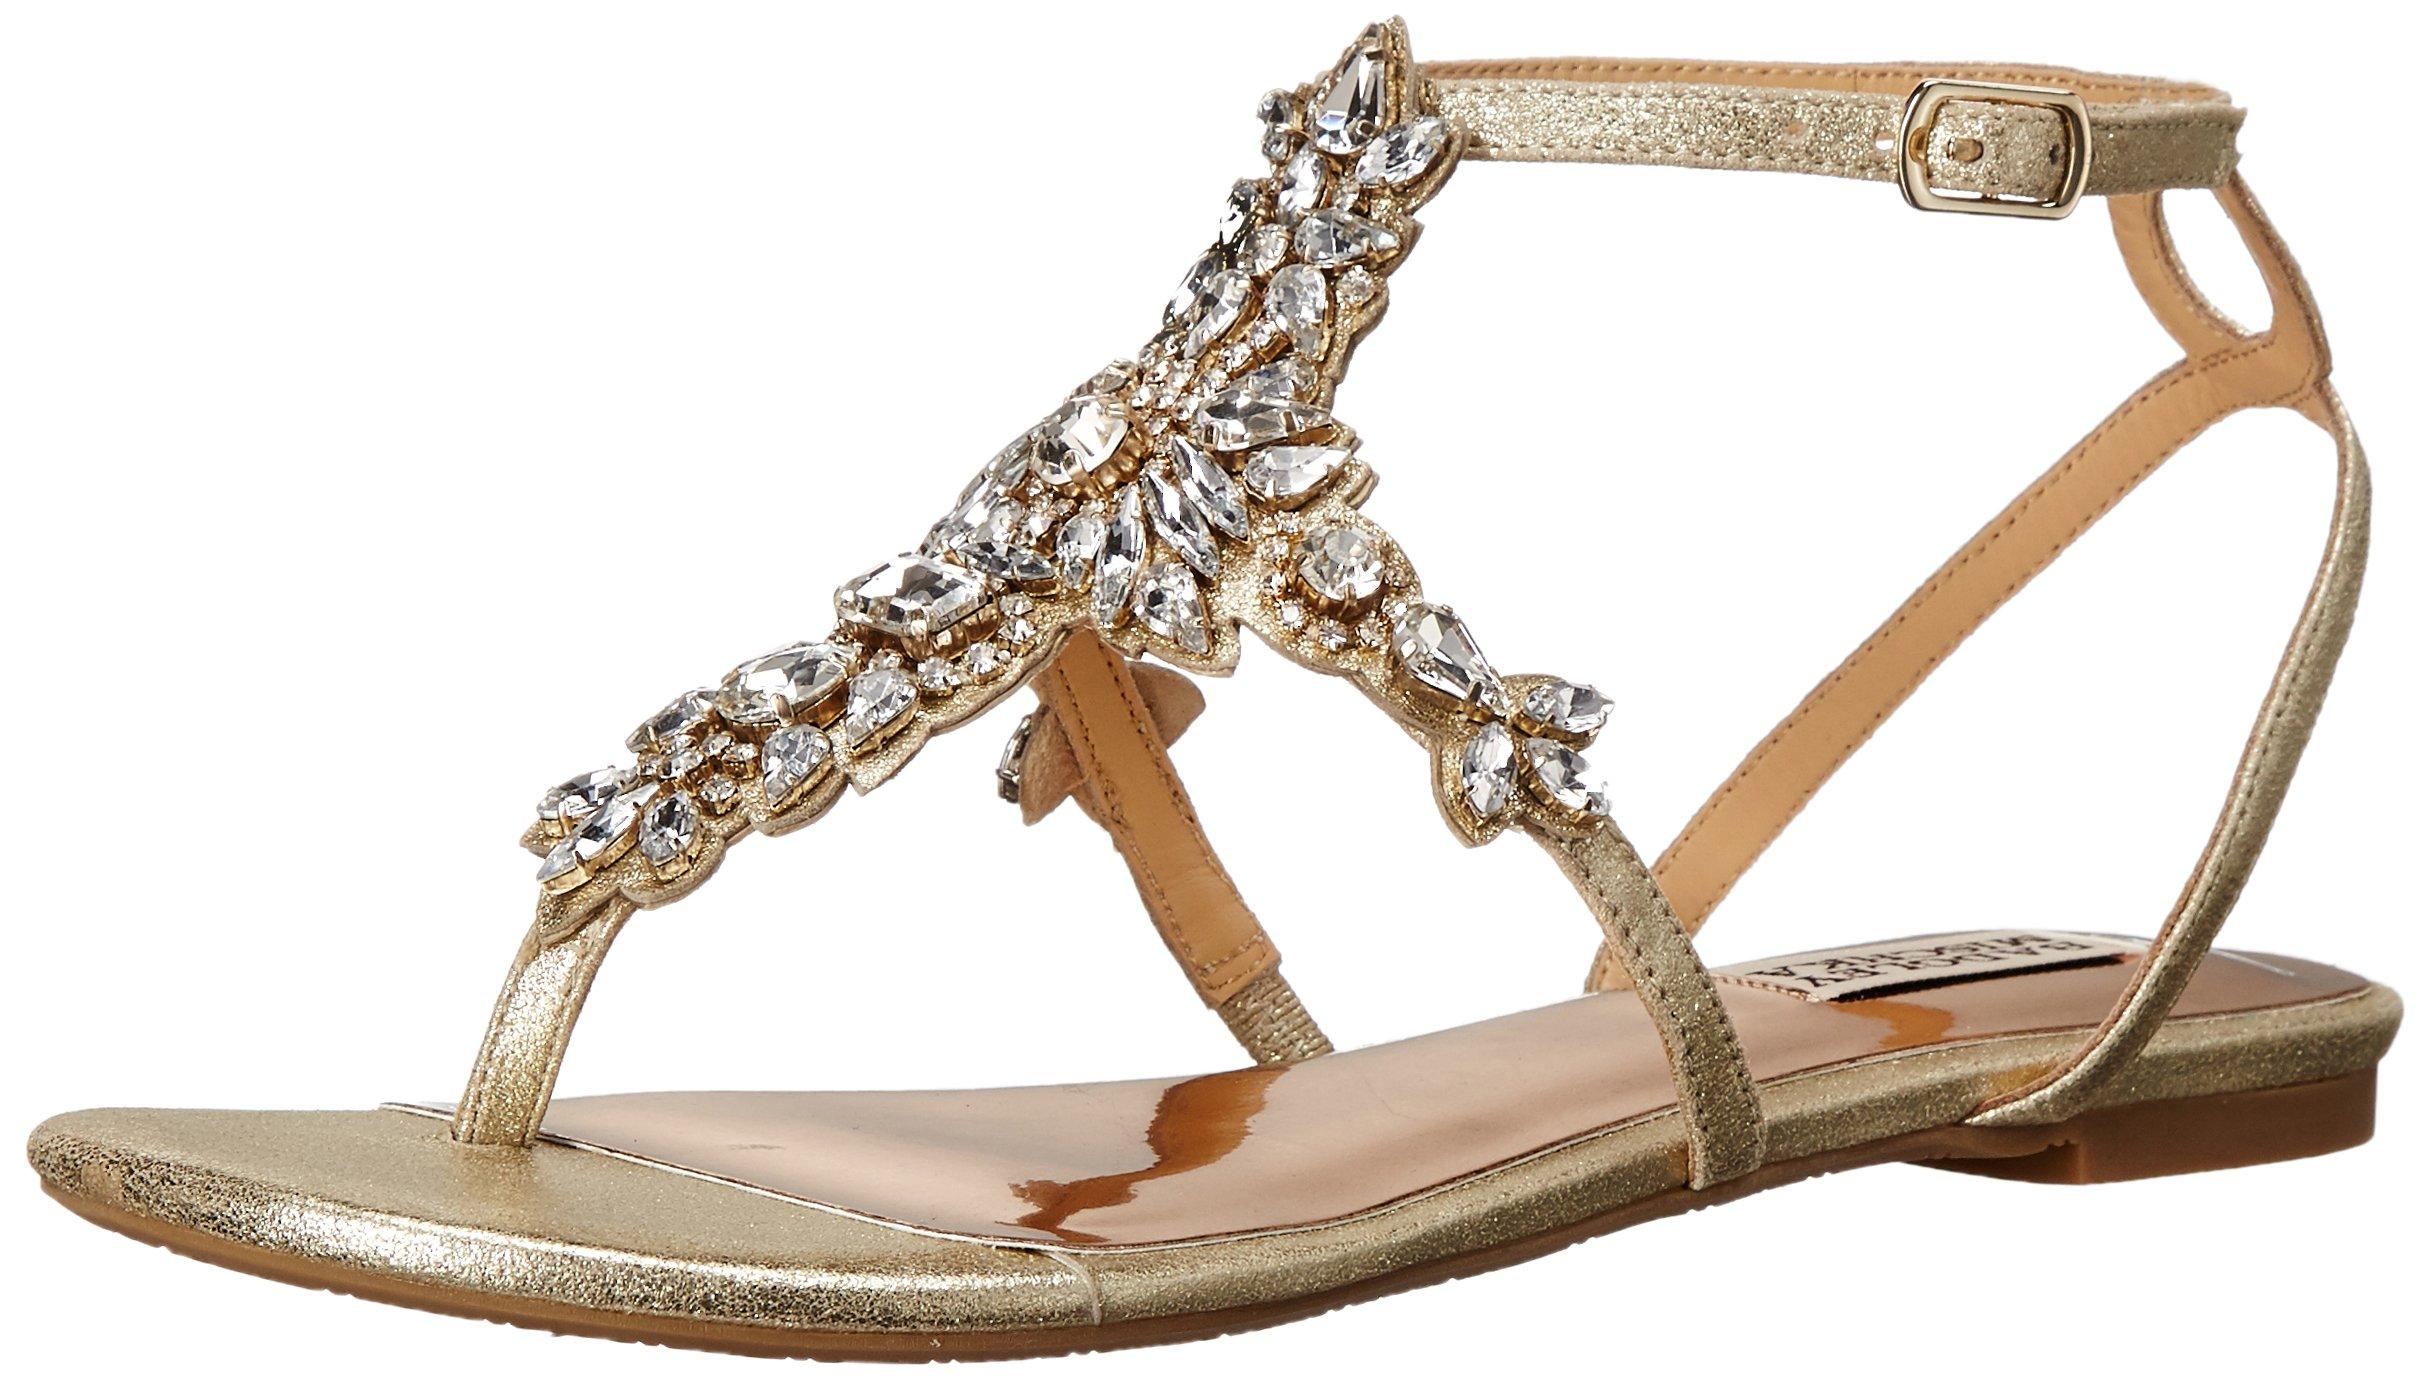 Badgley Mischka Women's Cara II Dress Sandal, Platino, 5.5 M US